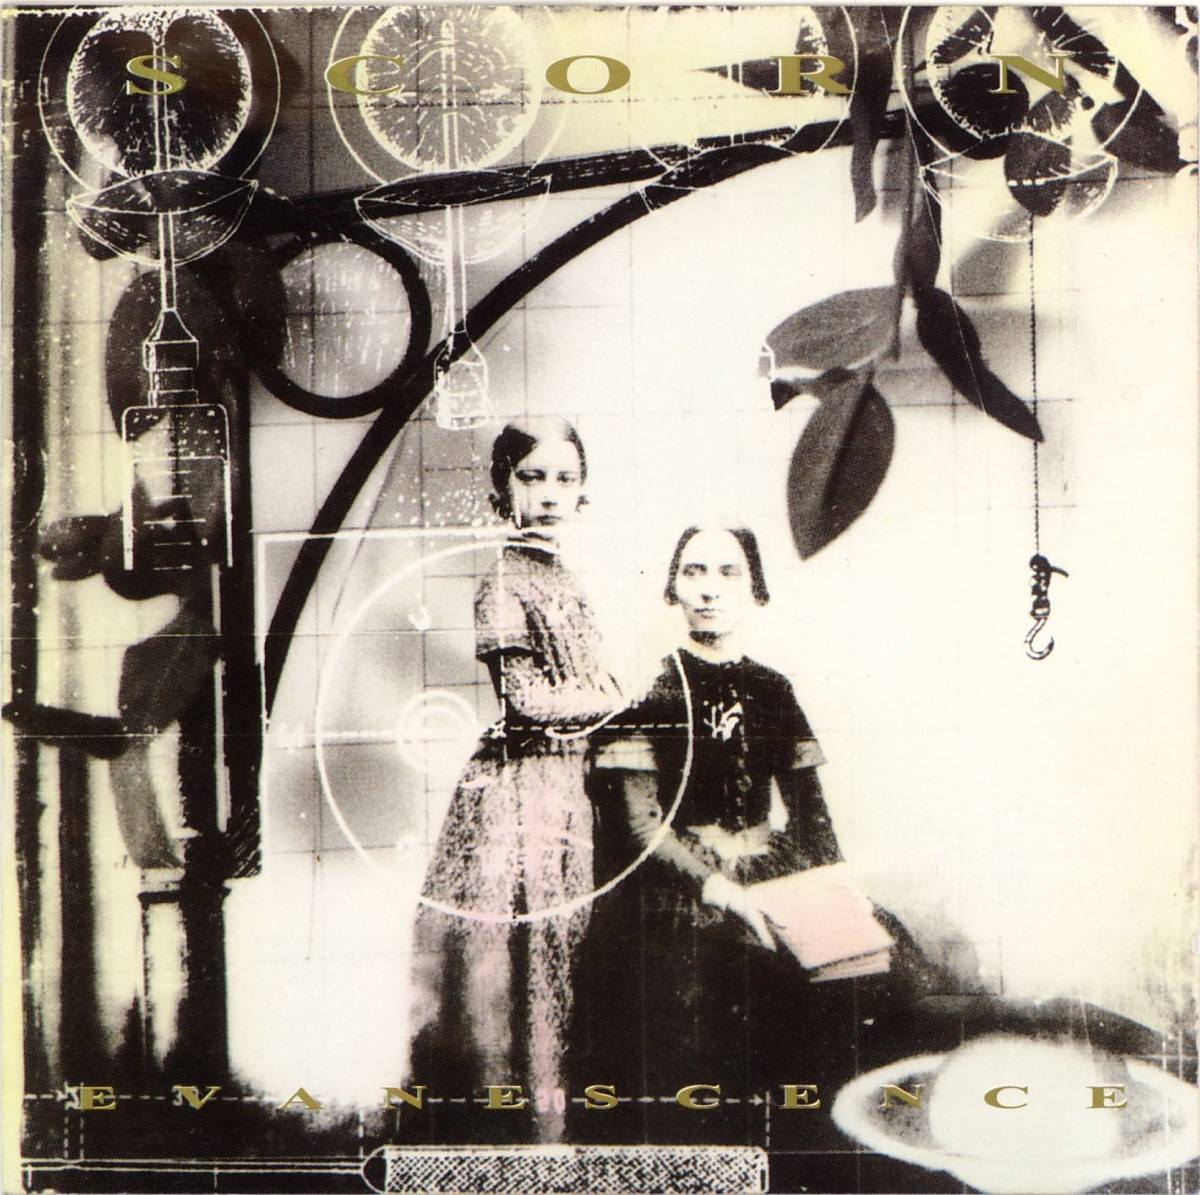 Evanescence Scorn CD cover